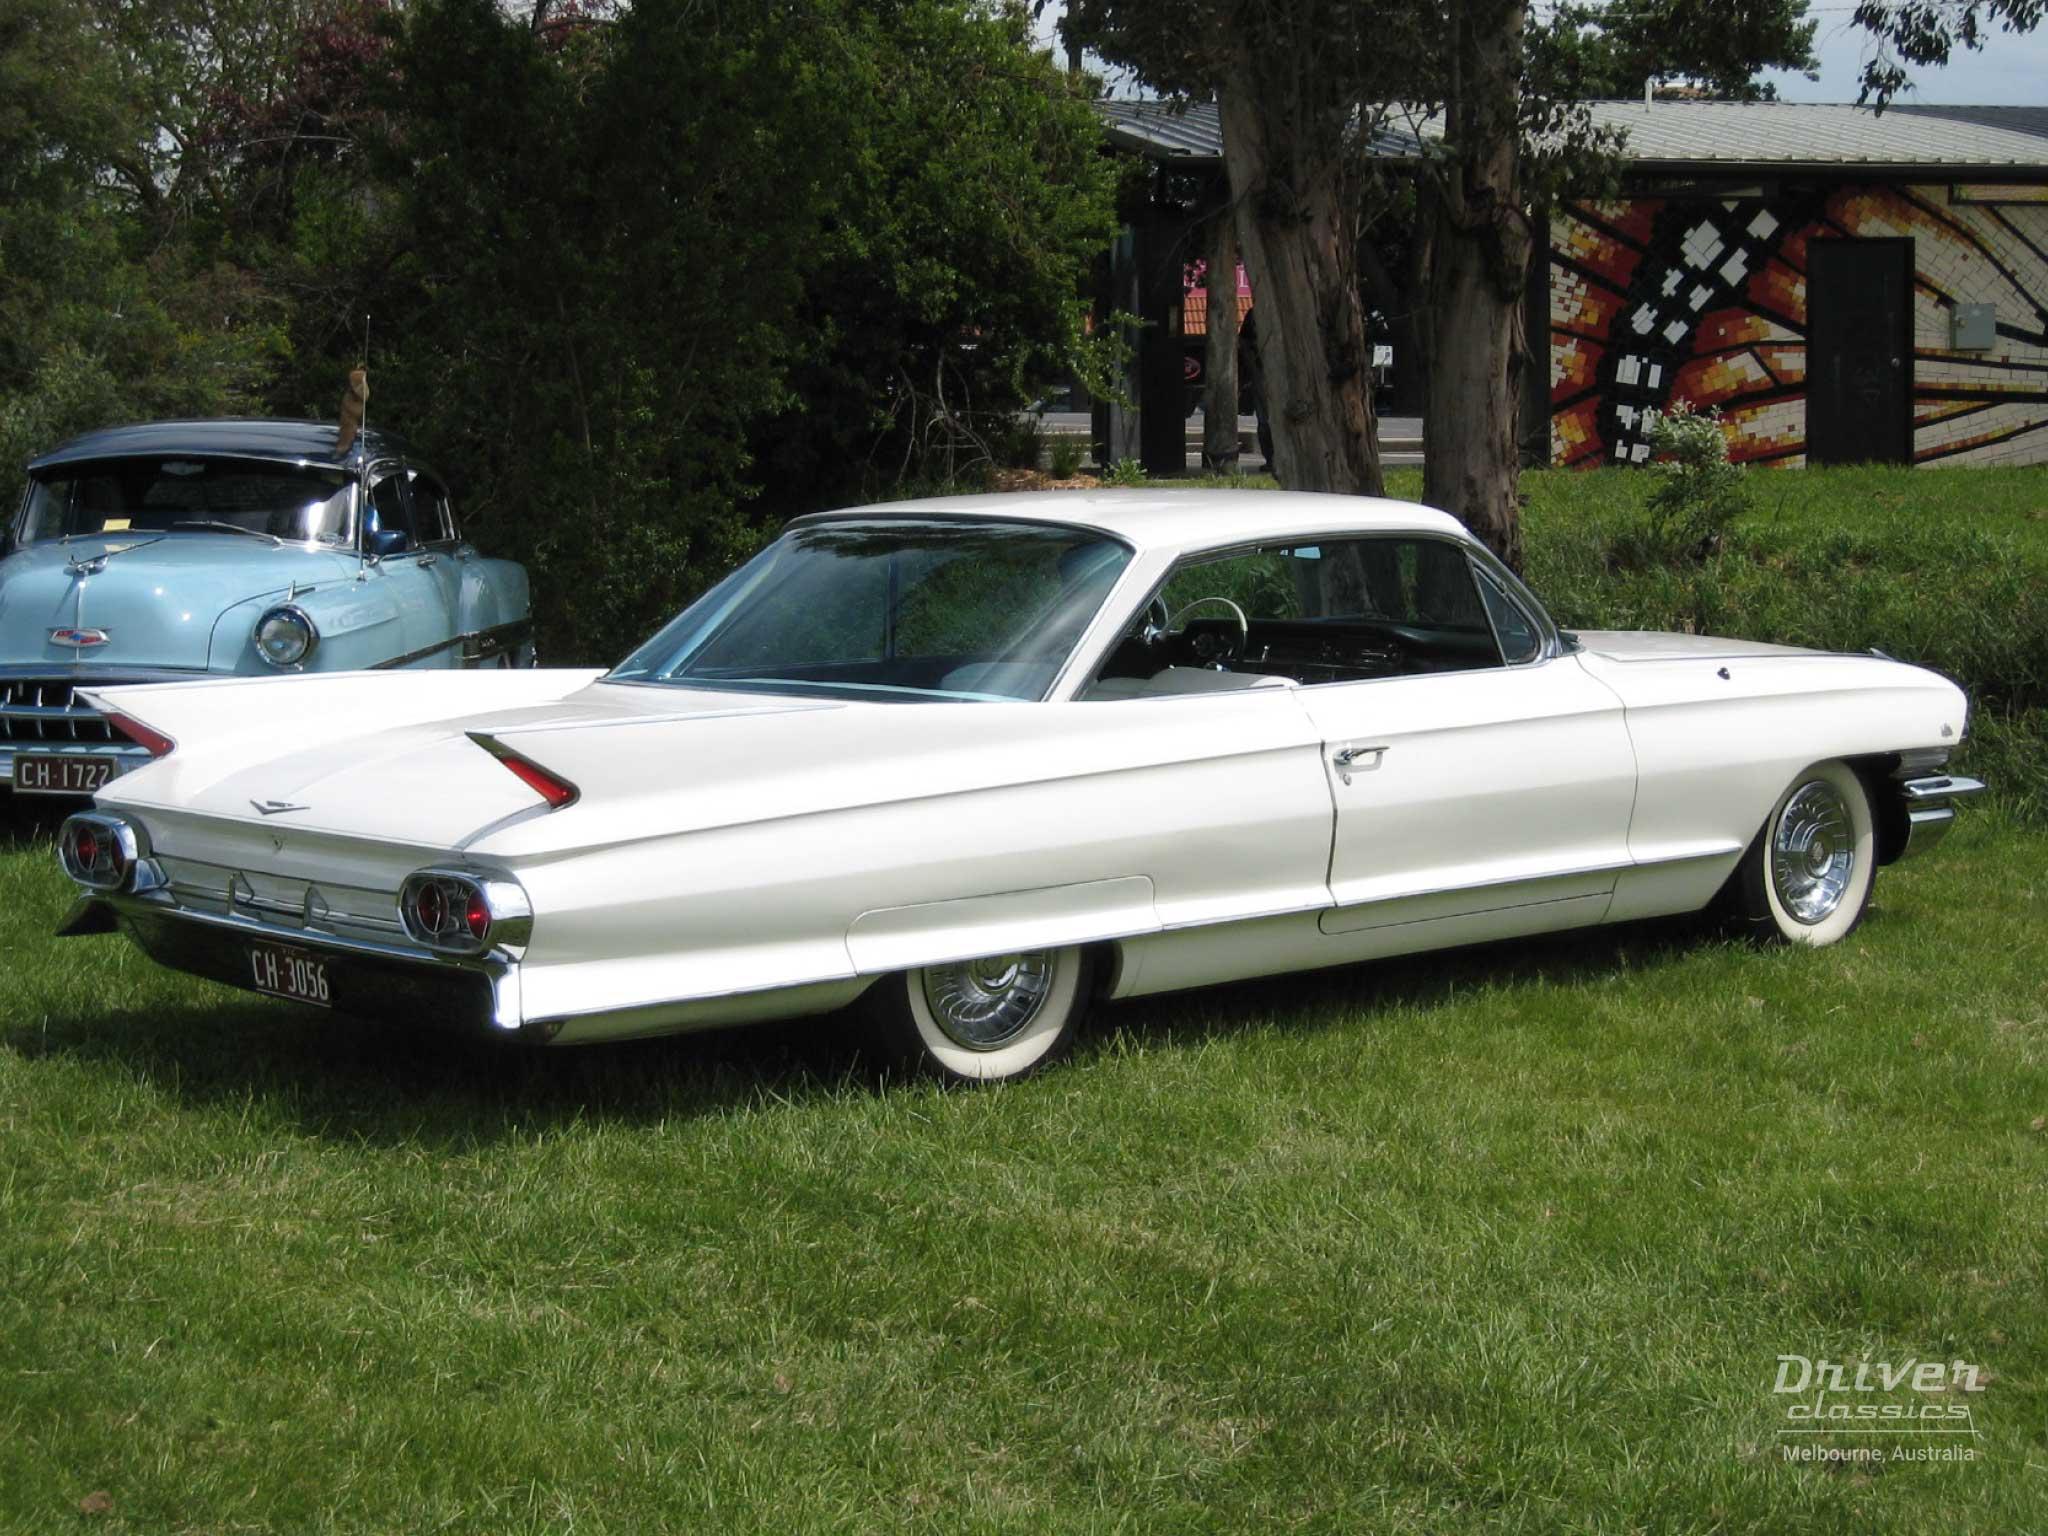 White 1961 Cadillac Coupe de Ville